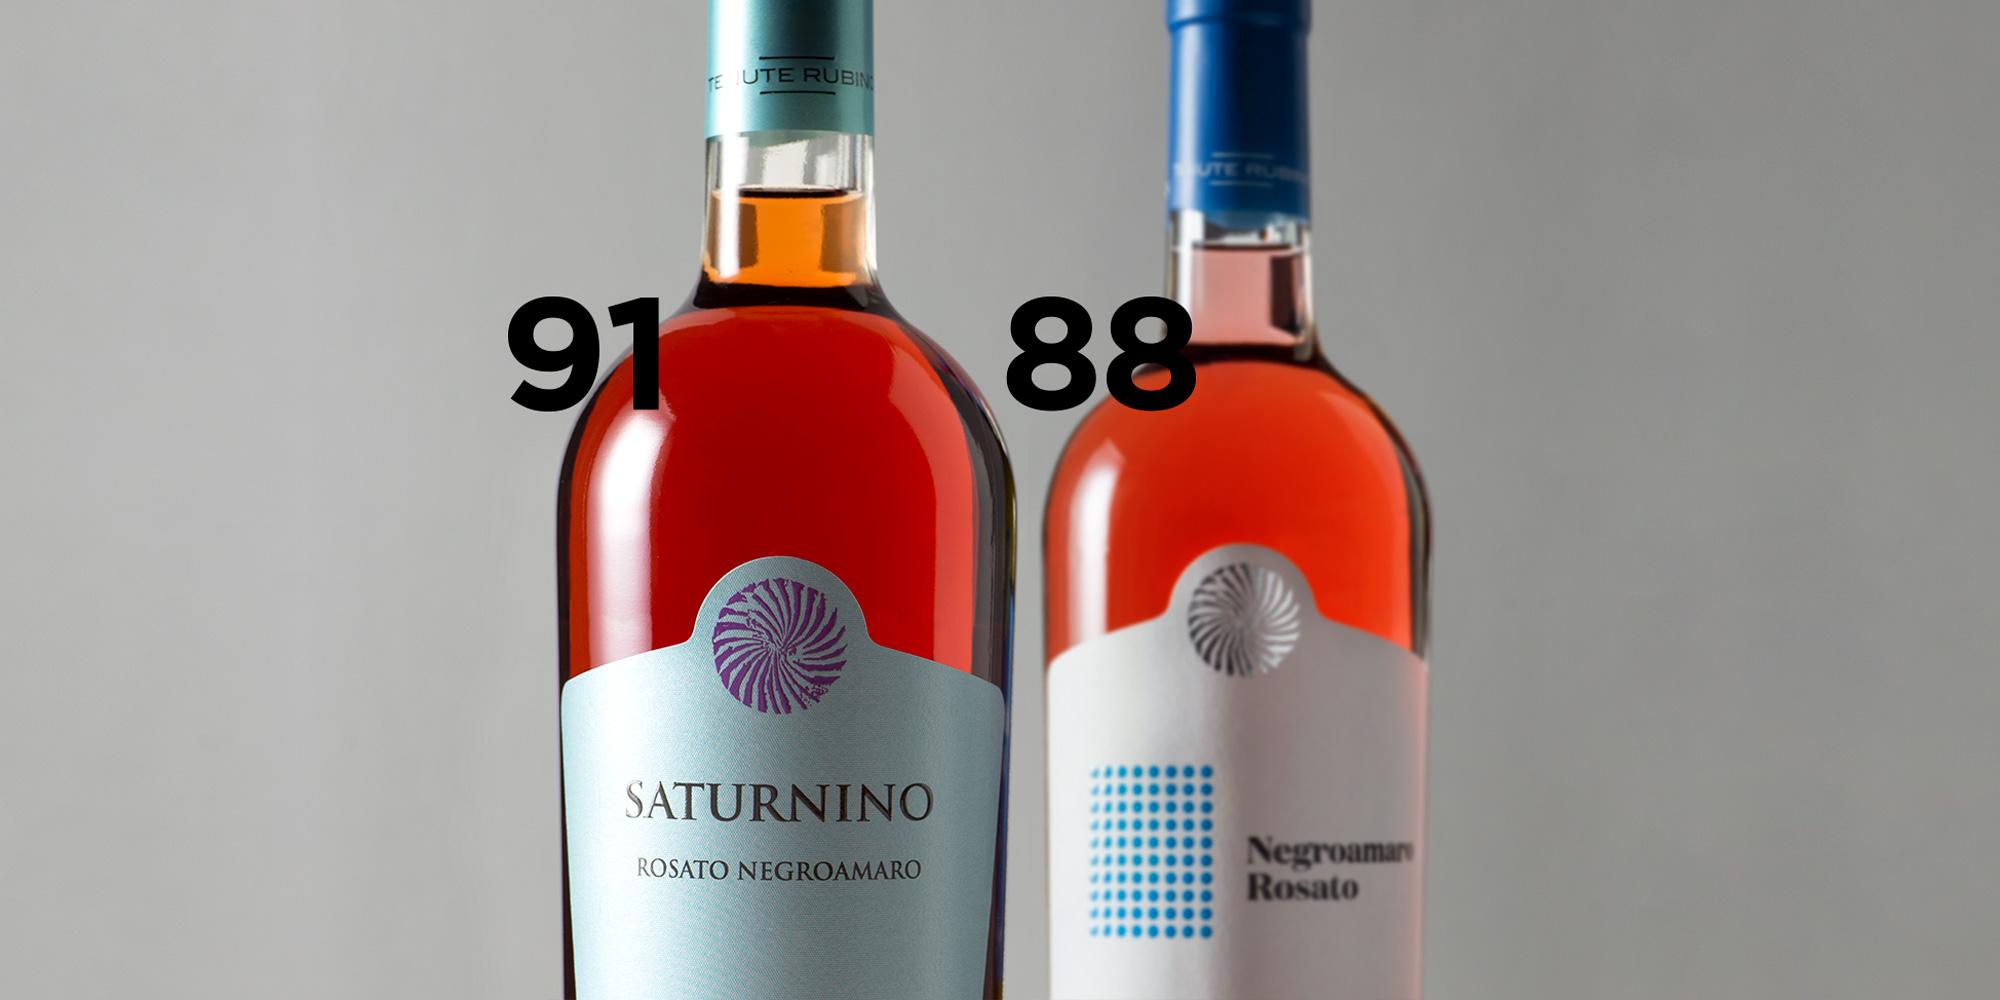 Saturnino e Negroamaro Rosato - Vinoteca Numero Primo